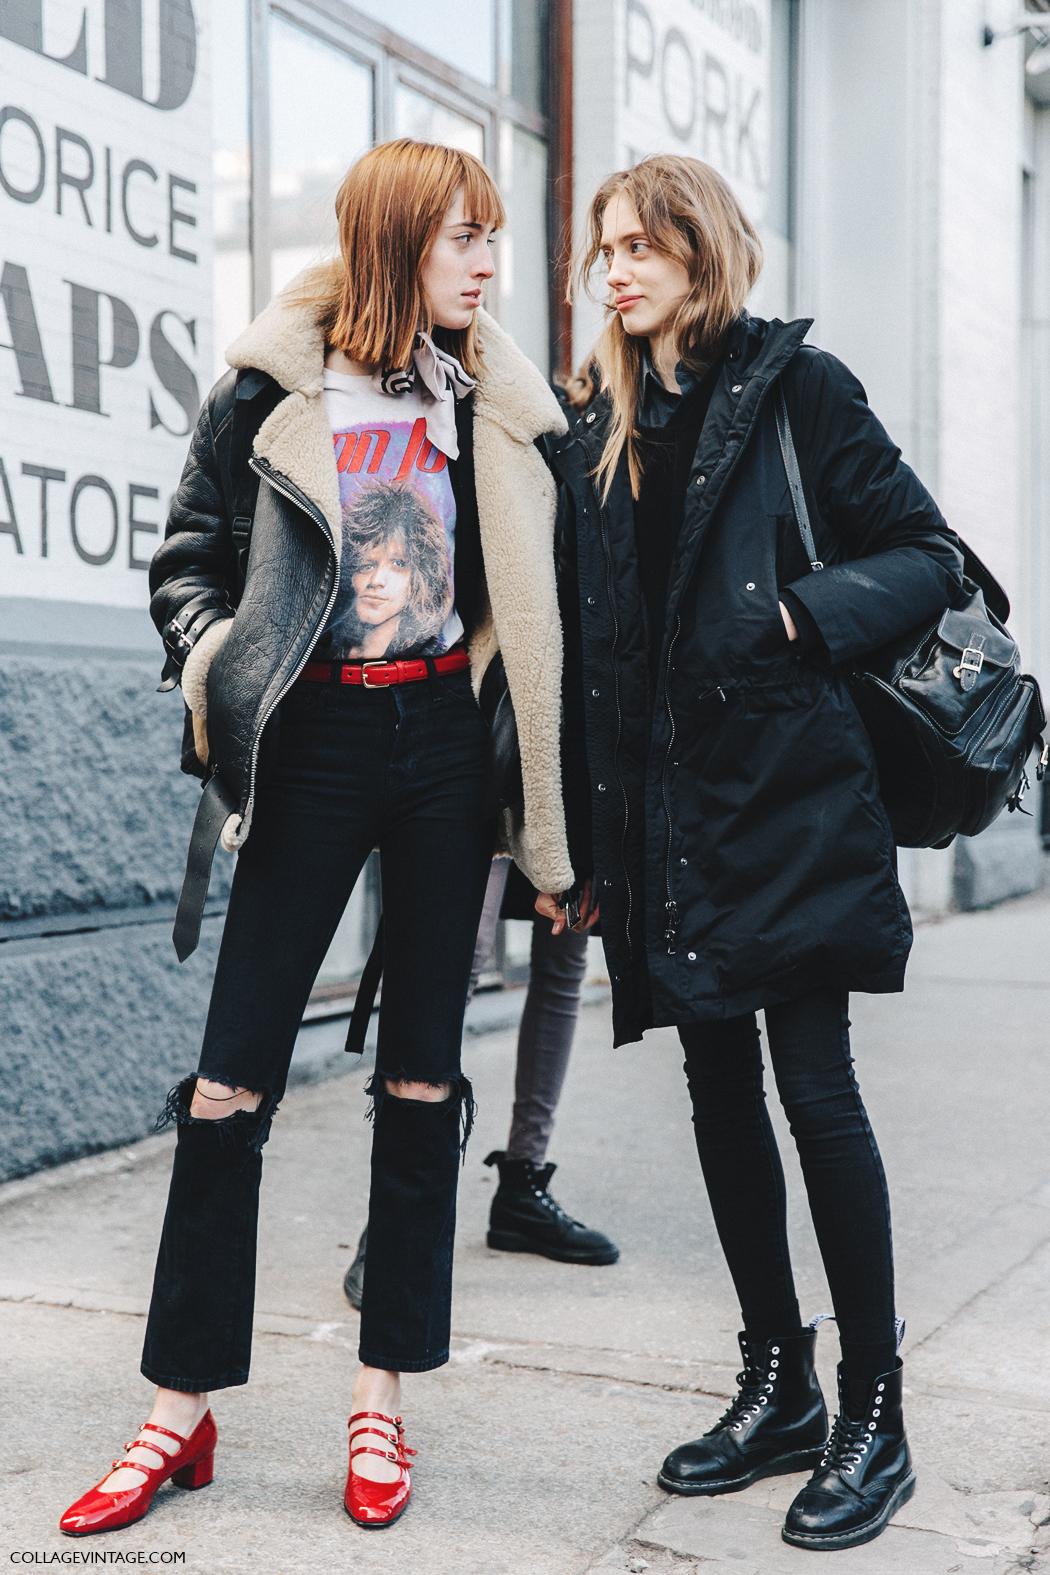 NYFW-New_York_Fashion_Week-Fall_Winter-17-Street_Style-Aviator_Jacket-Shearling_Coat-2